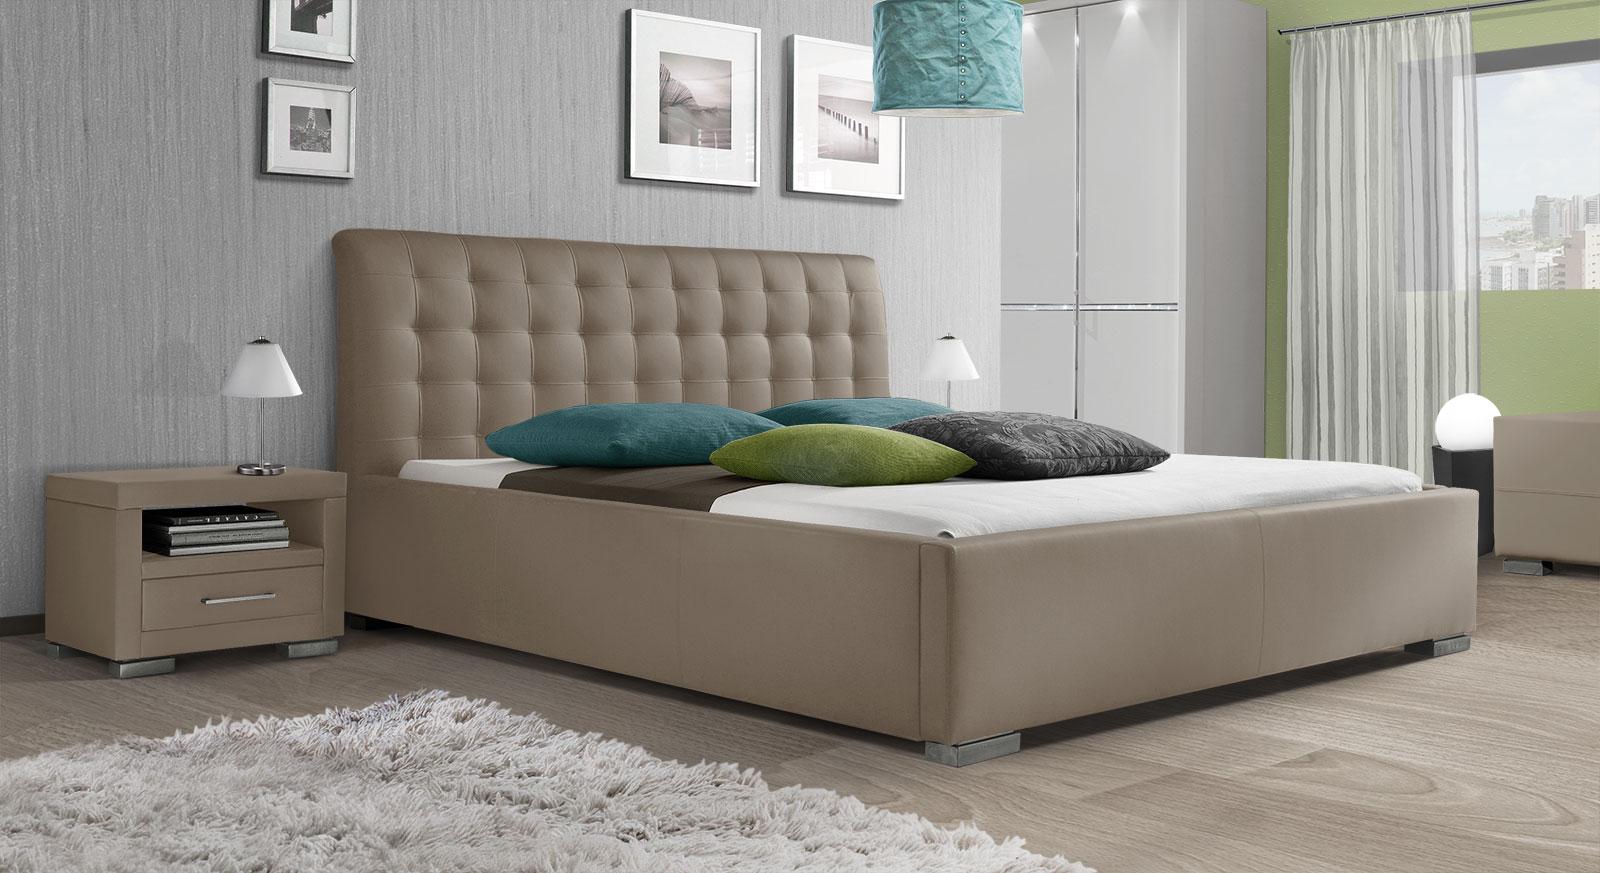 Bett Baskerville Comfort mit grau-braunem Kunstleder-Bezug